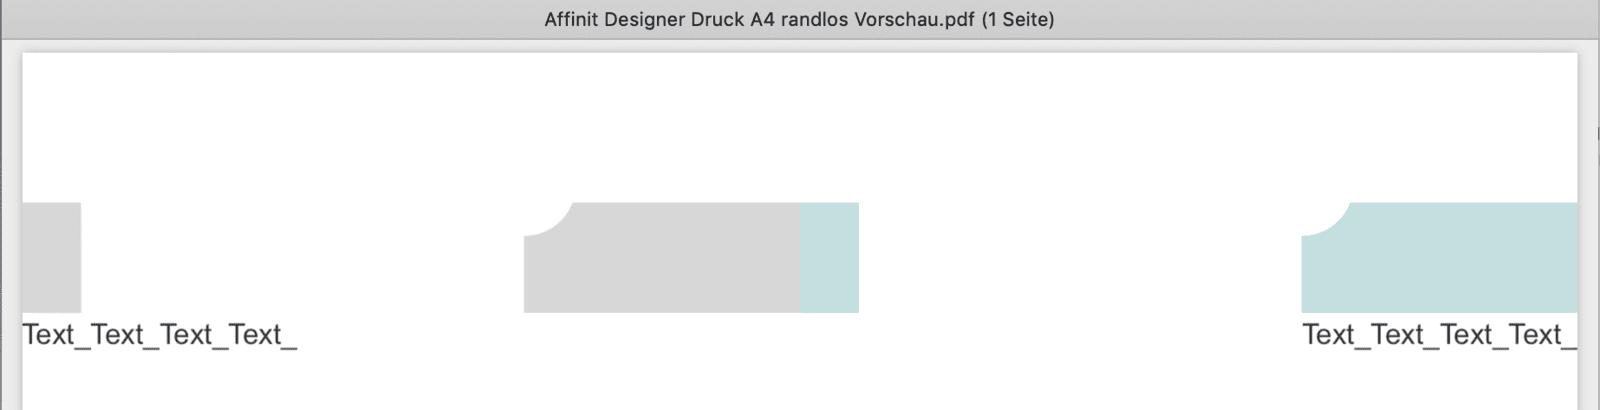 Affinit Designer Druck A4 randlos Vorschau.png